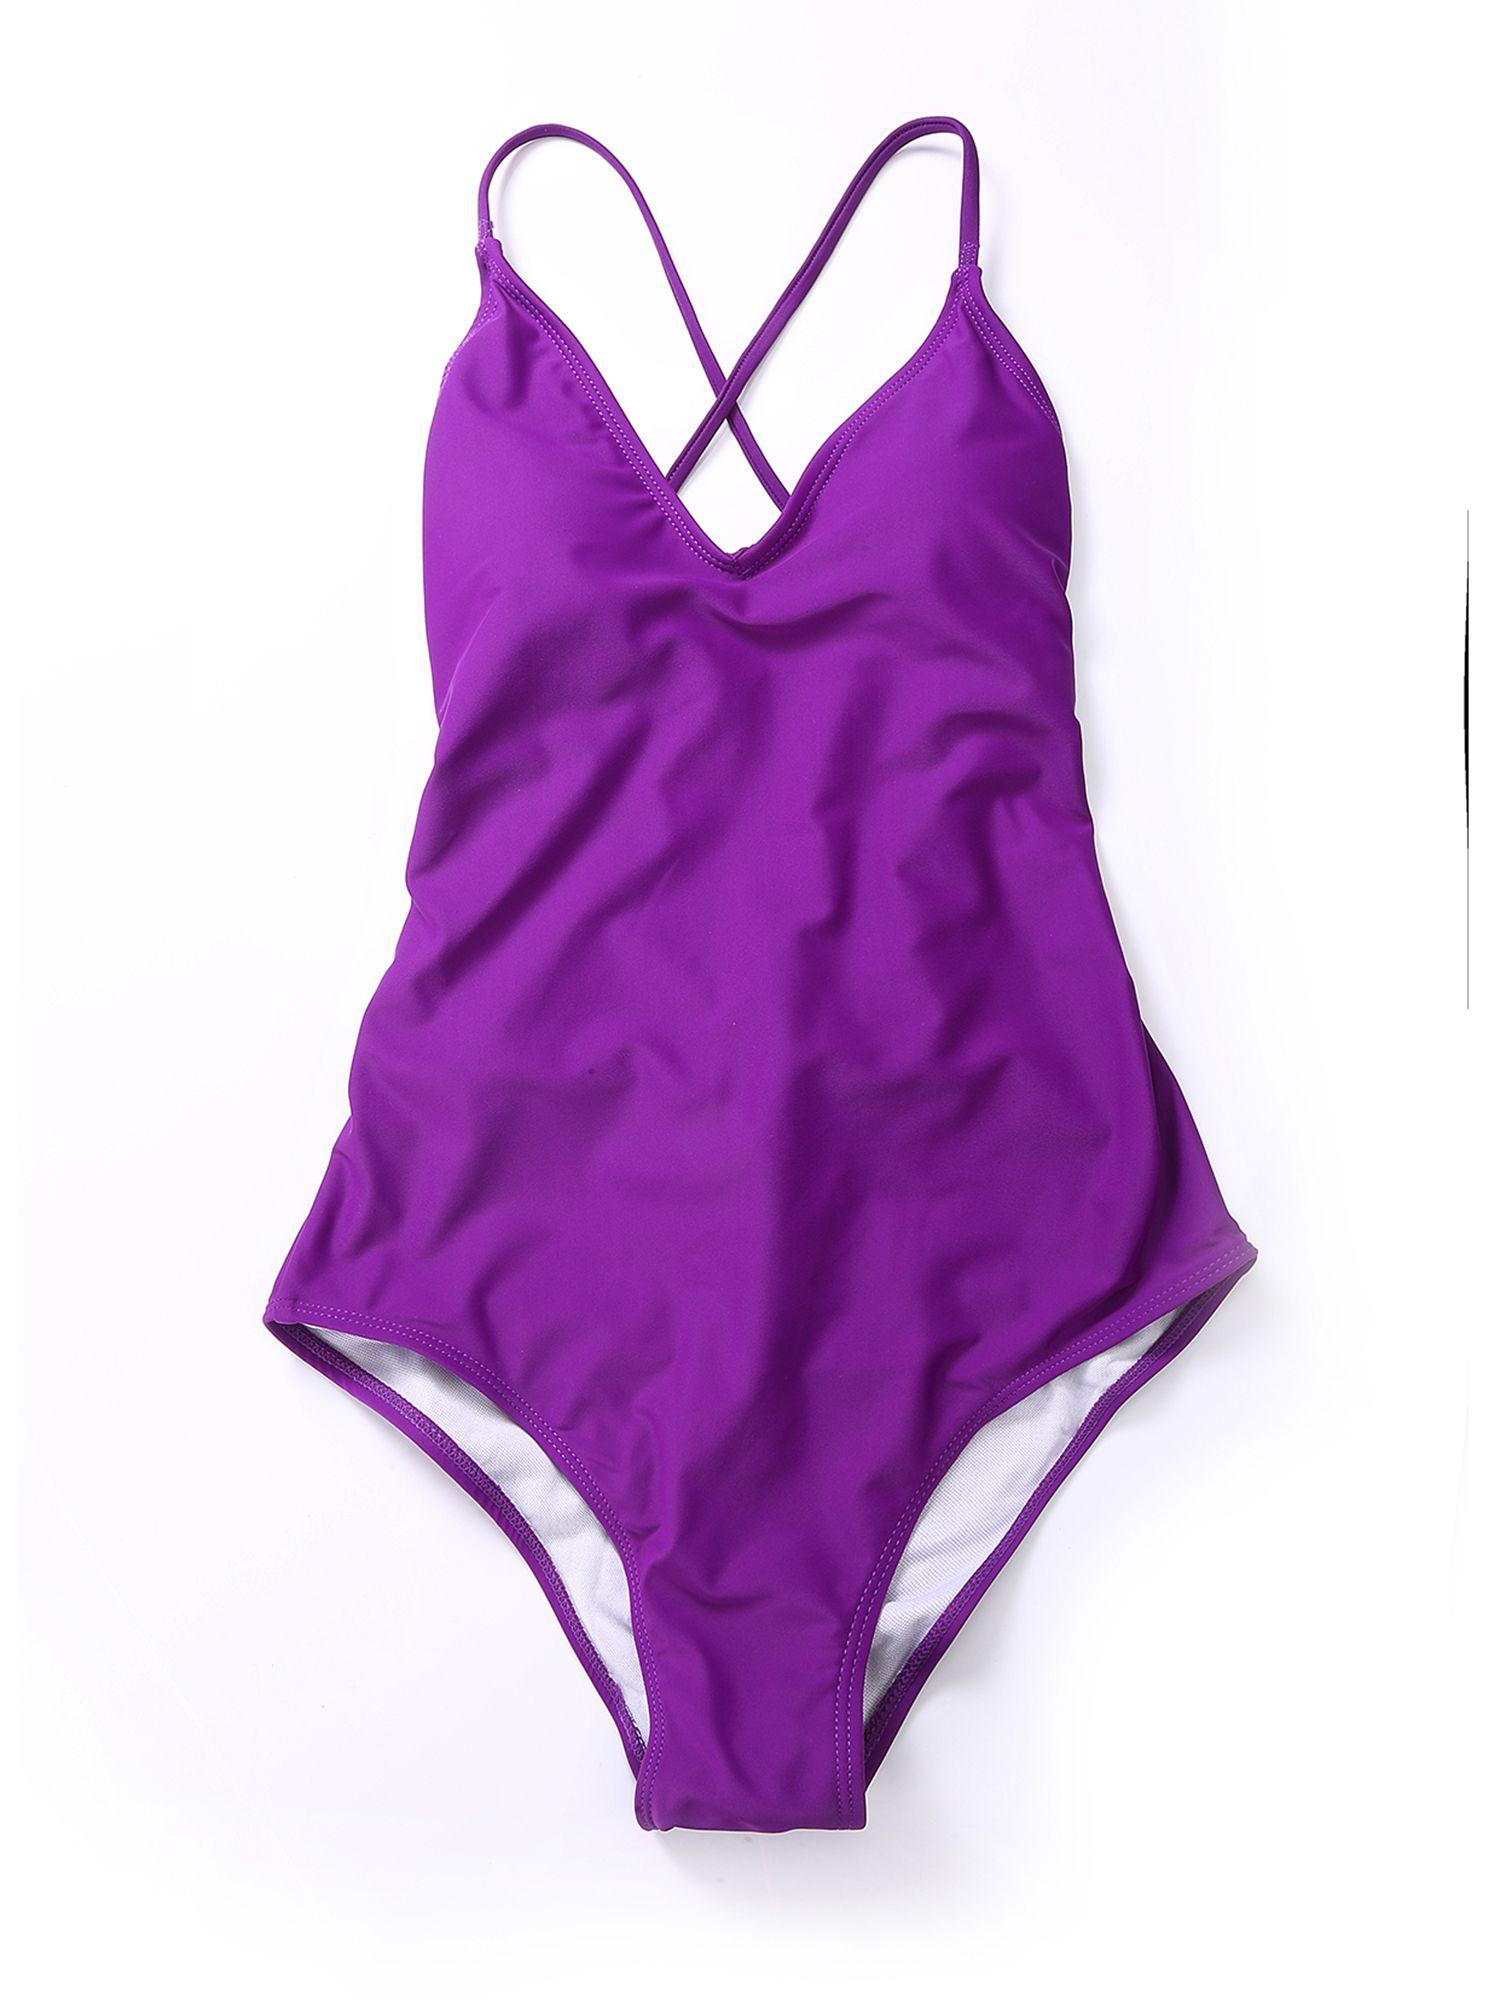 ef5cb72522 Classic Juniors V-Neck One Piece Swimsuit Halter Push Up Padded Monokini  Swimwear Solid Color Bikini Bathing Suits#Swimsuit, #Halter, #Push